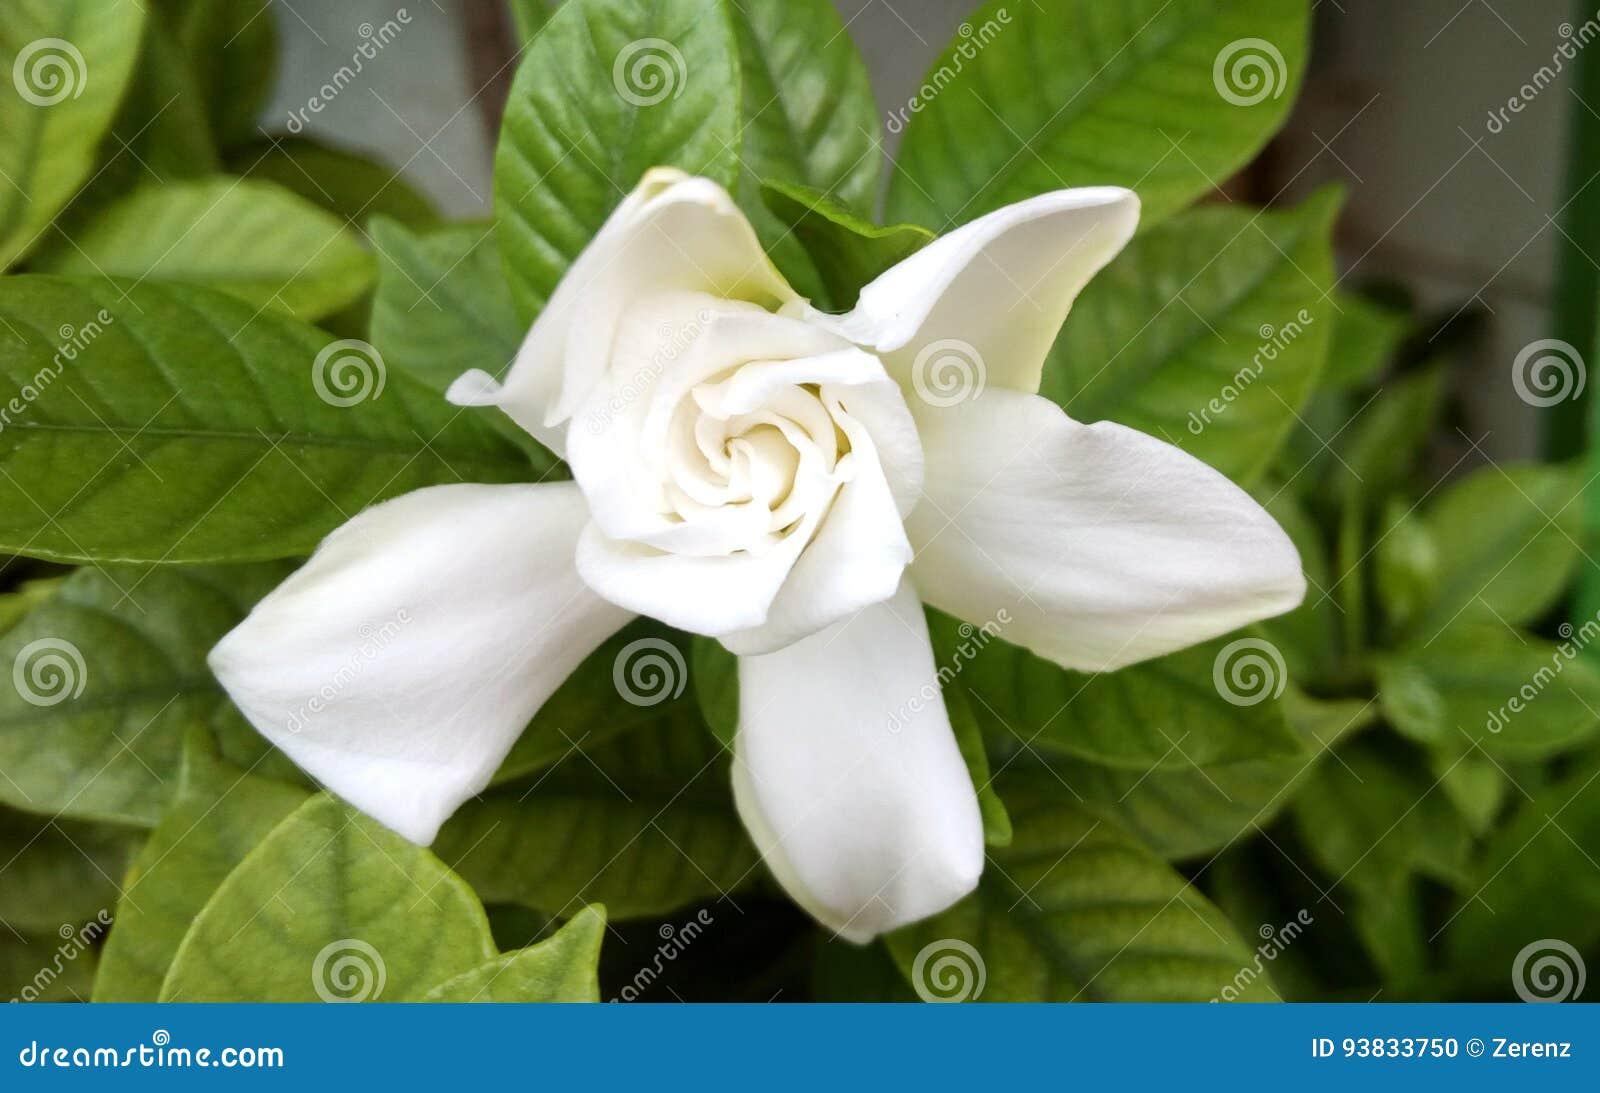 Cape jasmine or gardenia jasmine flower stock photo image of download cape jasmine or gardenia jasmine flower stock photo image of foliage leaf izmirmasajfo